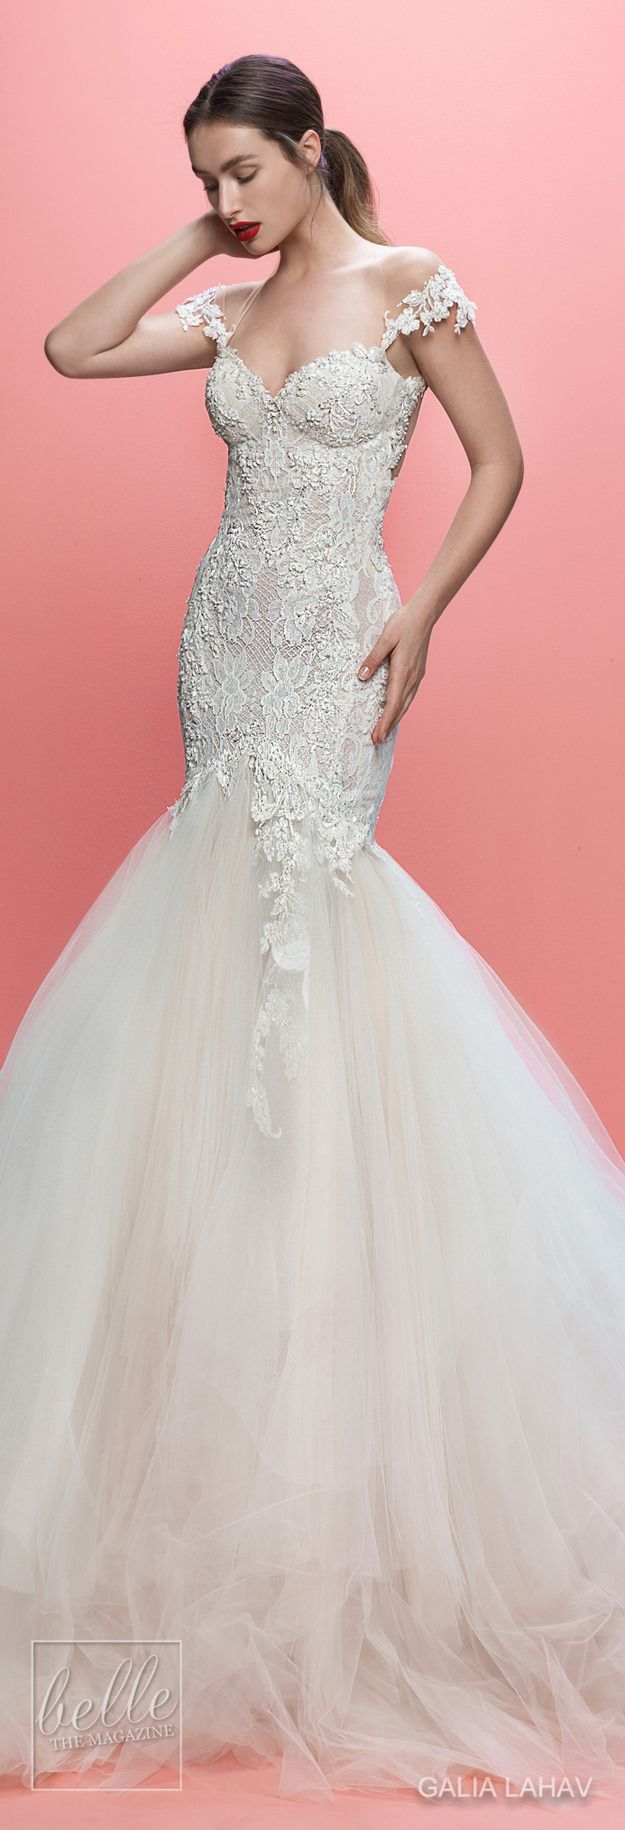 47 best Wedding Dresses images on Pinterest | Wedding frocks ...